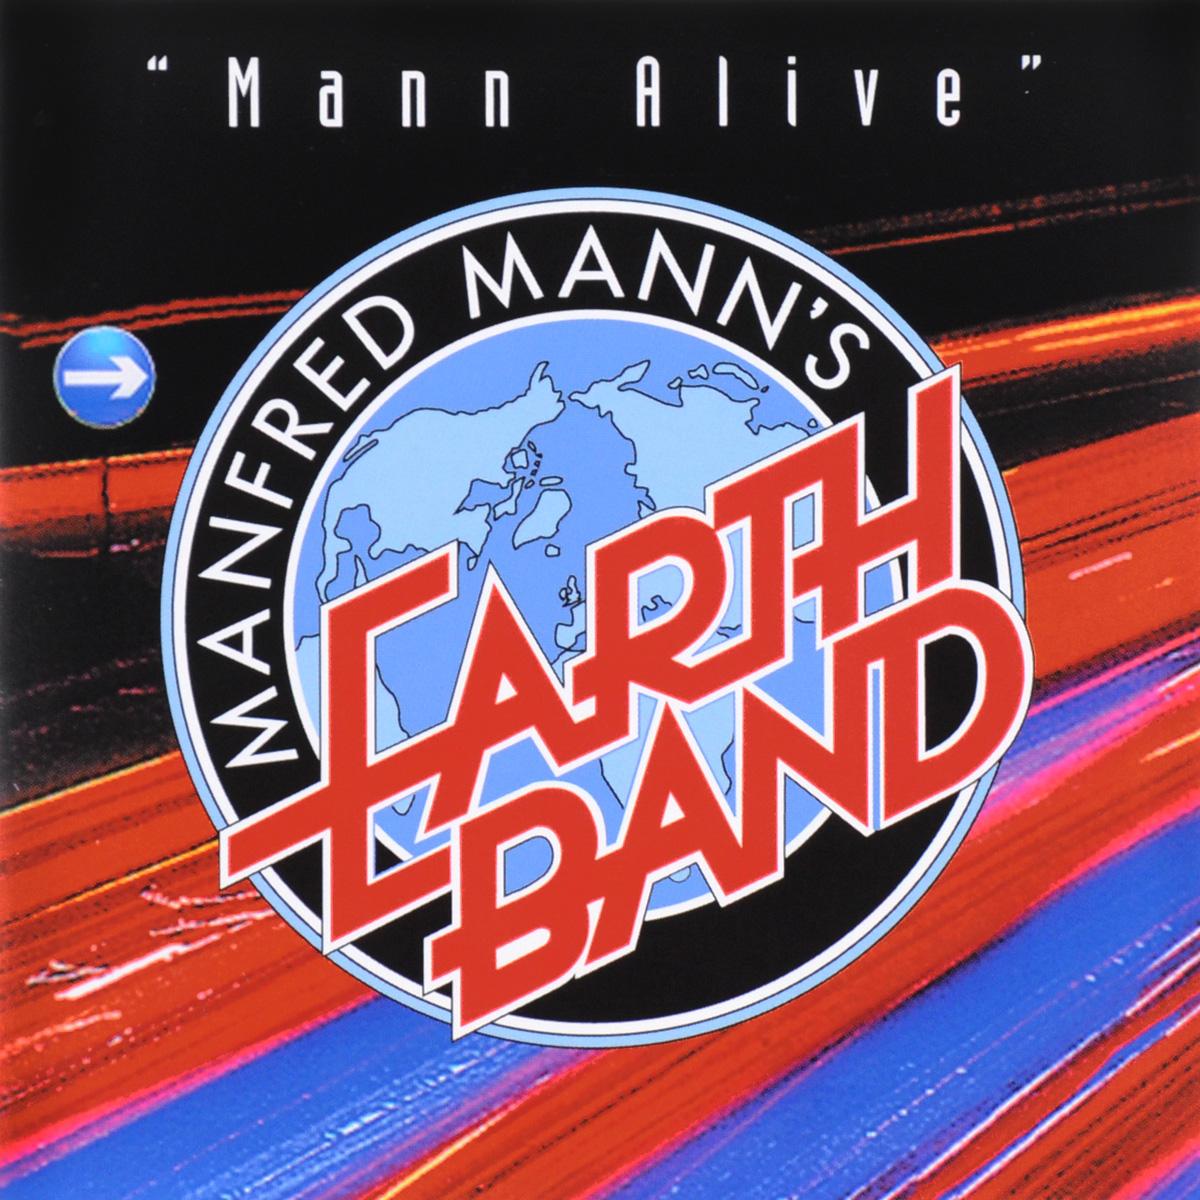 Manfred Mann's Earth Band Manfred Mann's Earth Band. Mann Alive (2 CD) manfred mann s earth band then